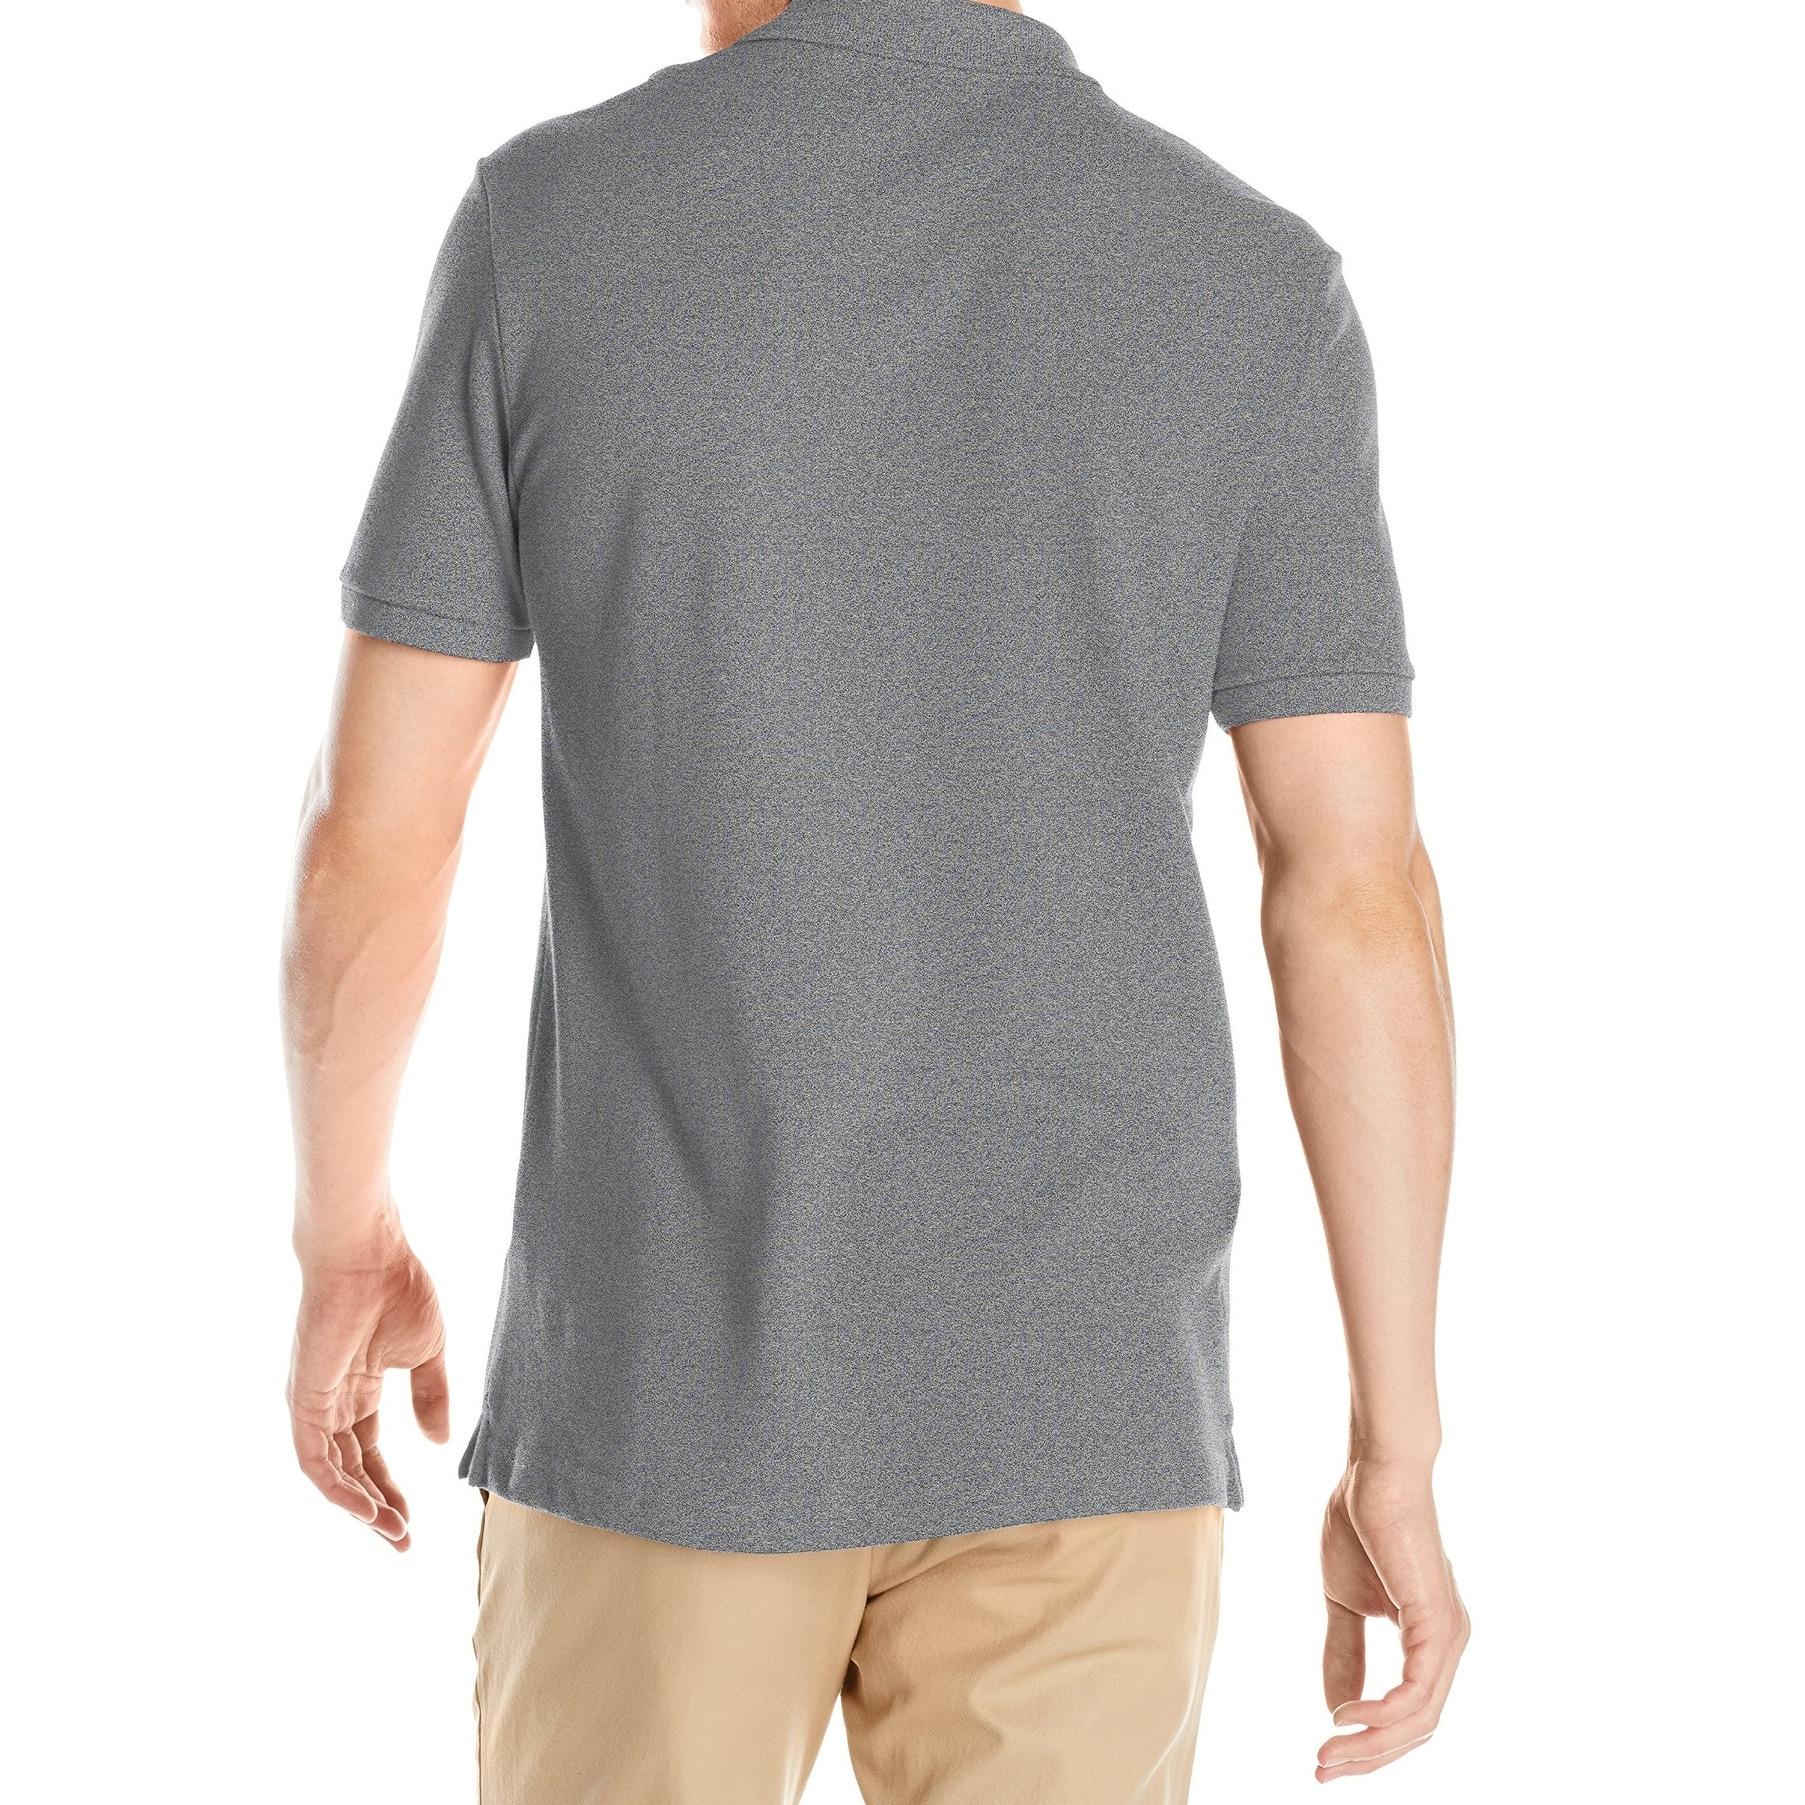 c42b3d897d Lacoste NEW Gray Mens Size Medium M Slim-Fit Short-Sleeve Polo Shirt